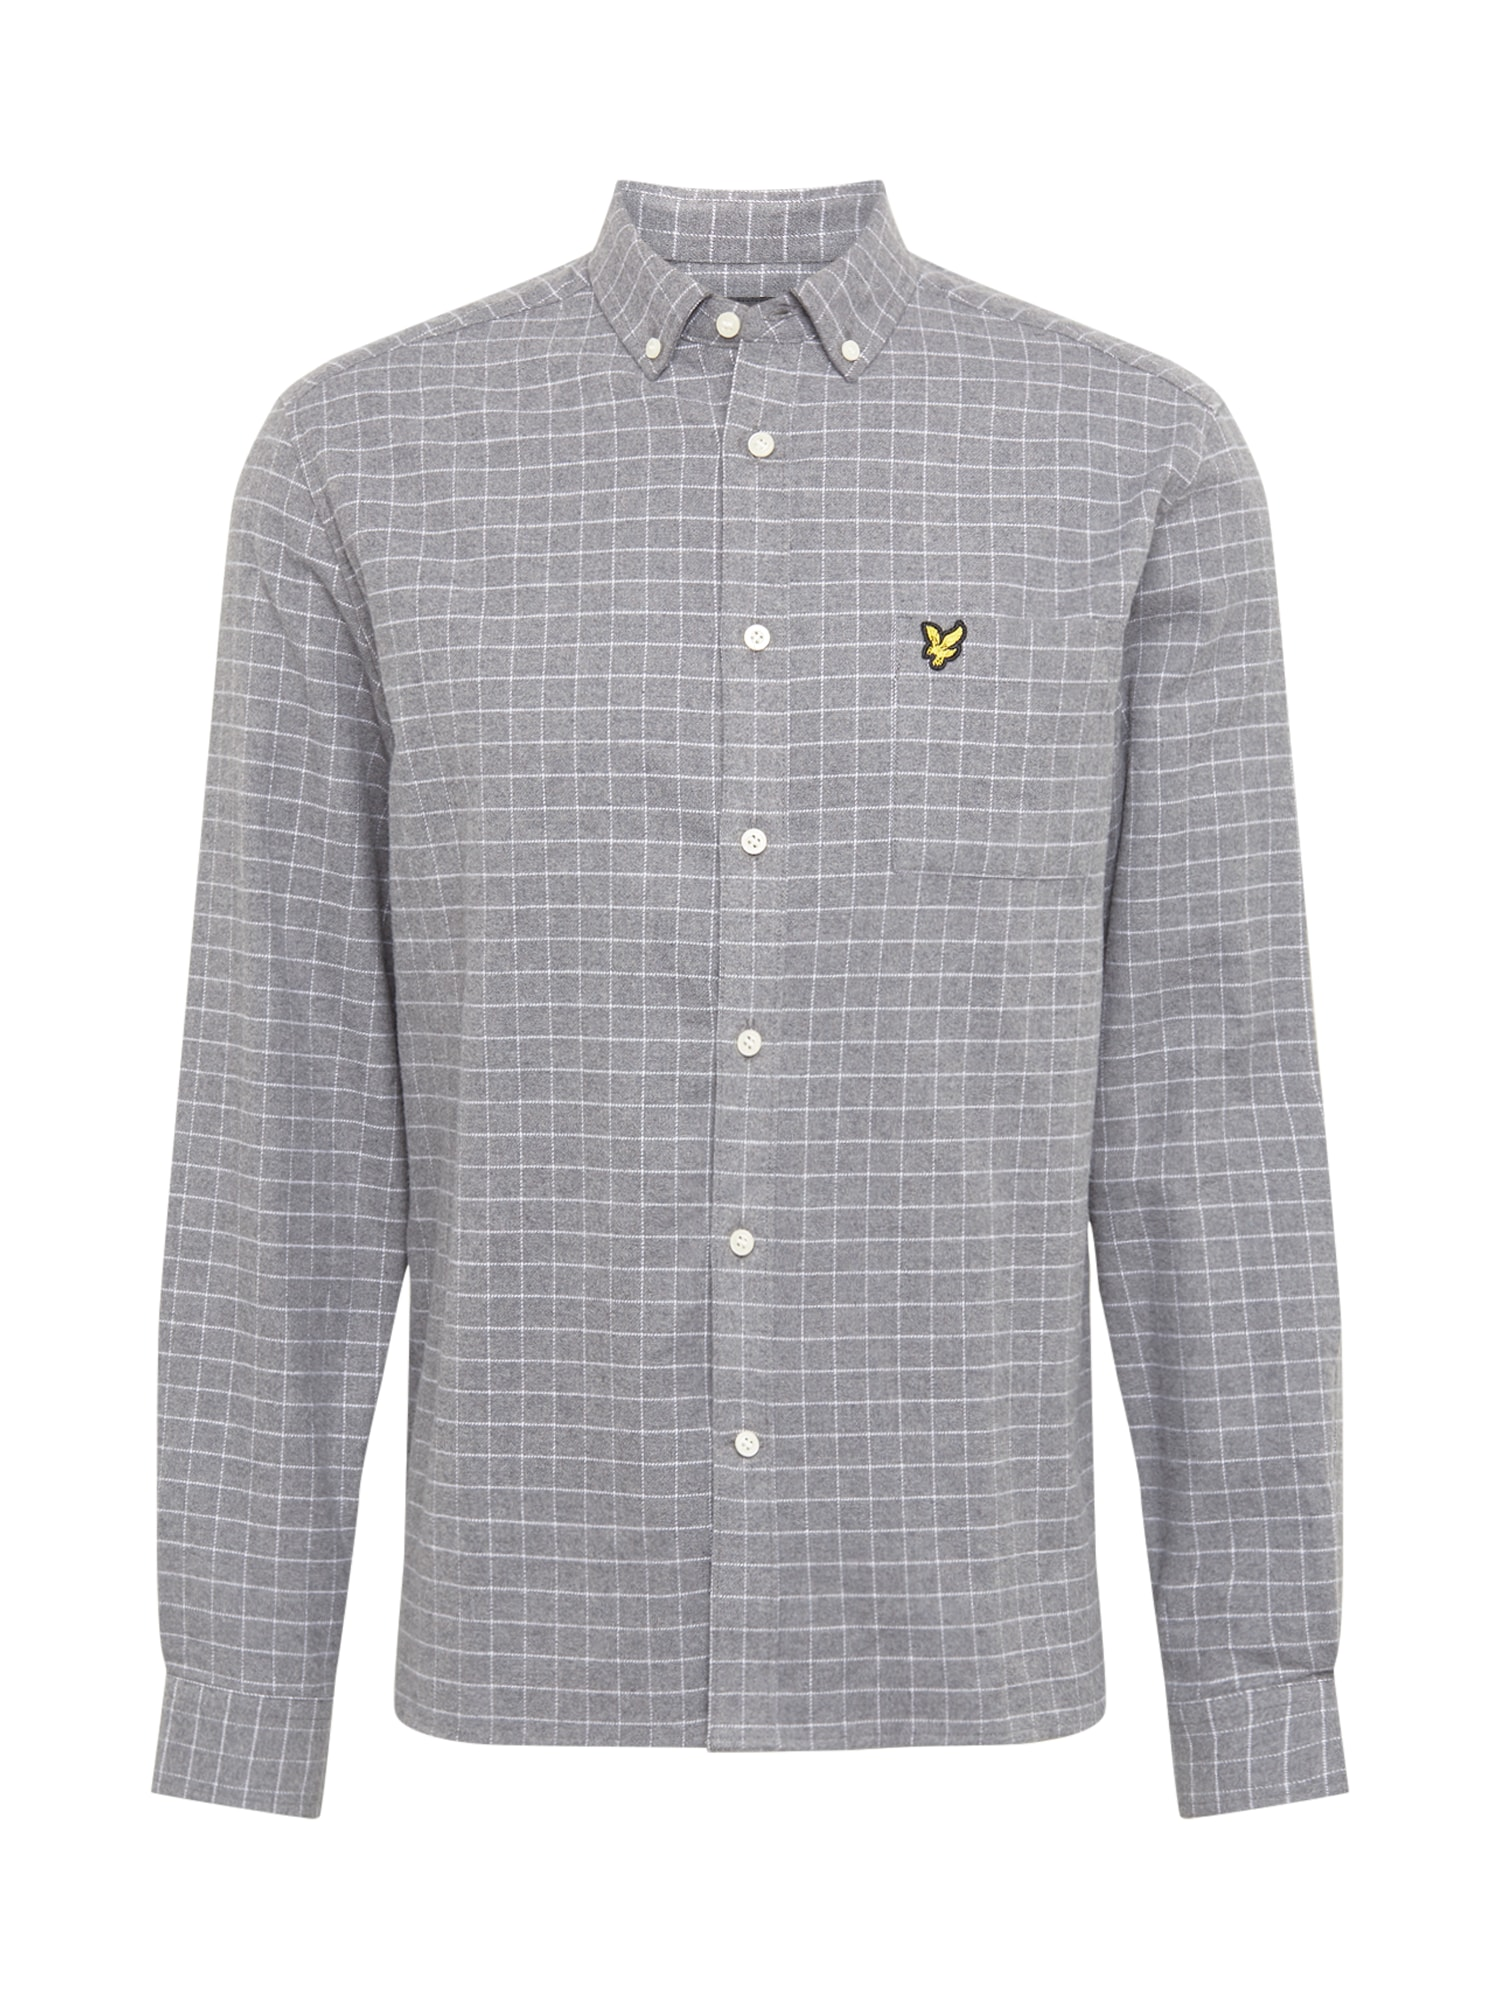 Lyle & Scott Marškiniai margai pilka / balta / geltona / juoda